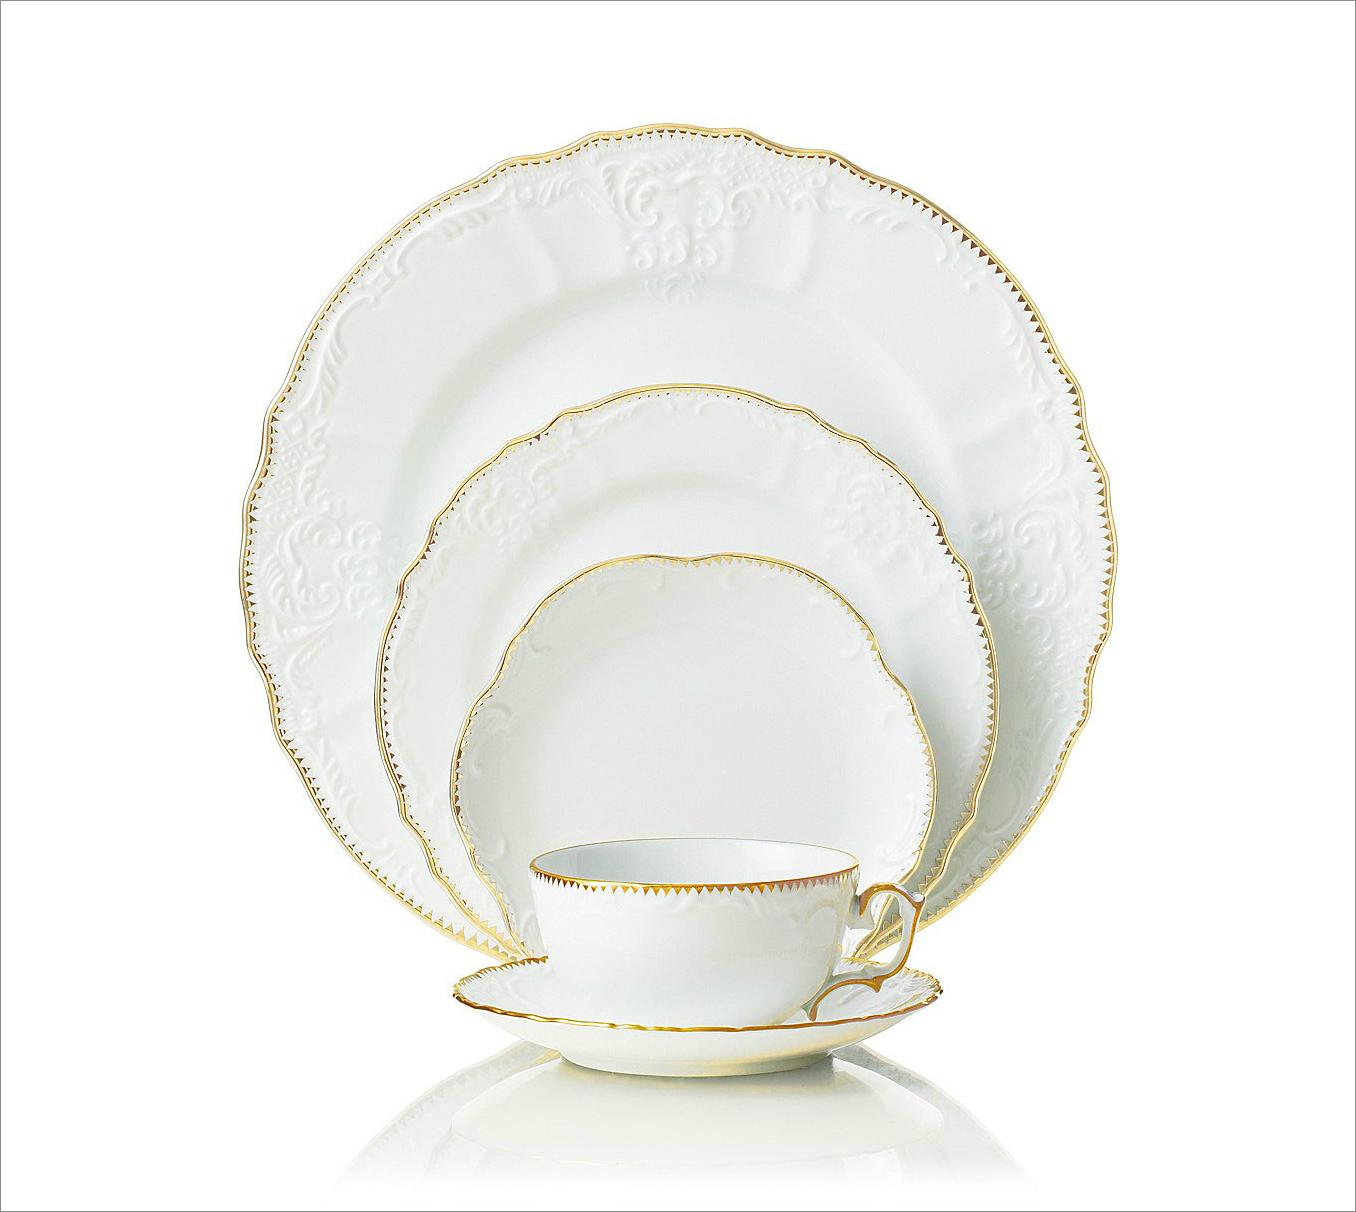 Simply Anna dinnerware, $43-70 by Anna Weatherly; gearys.com